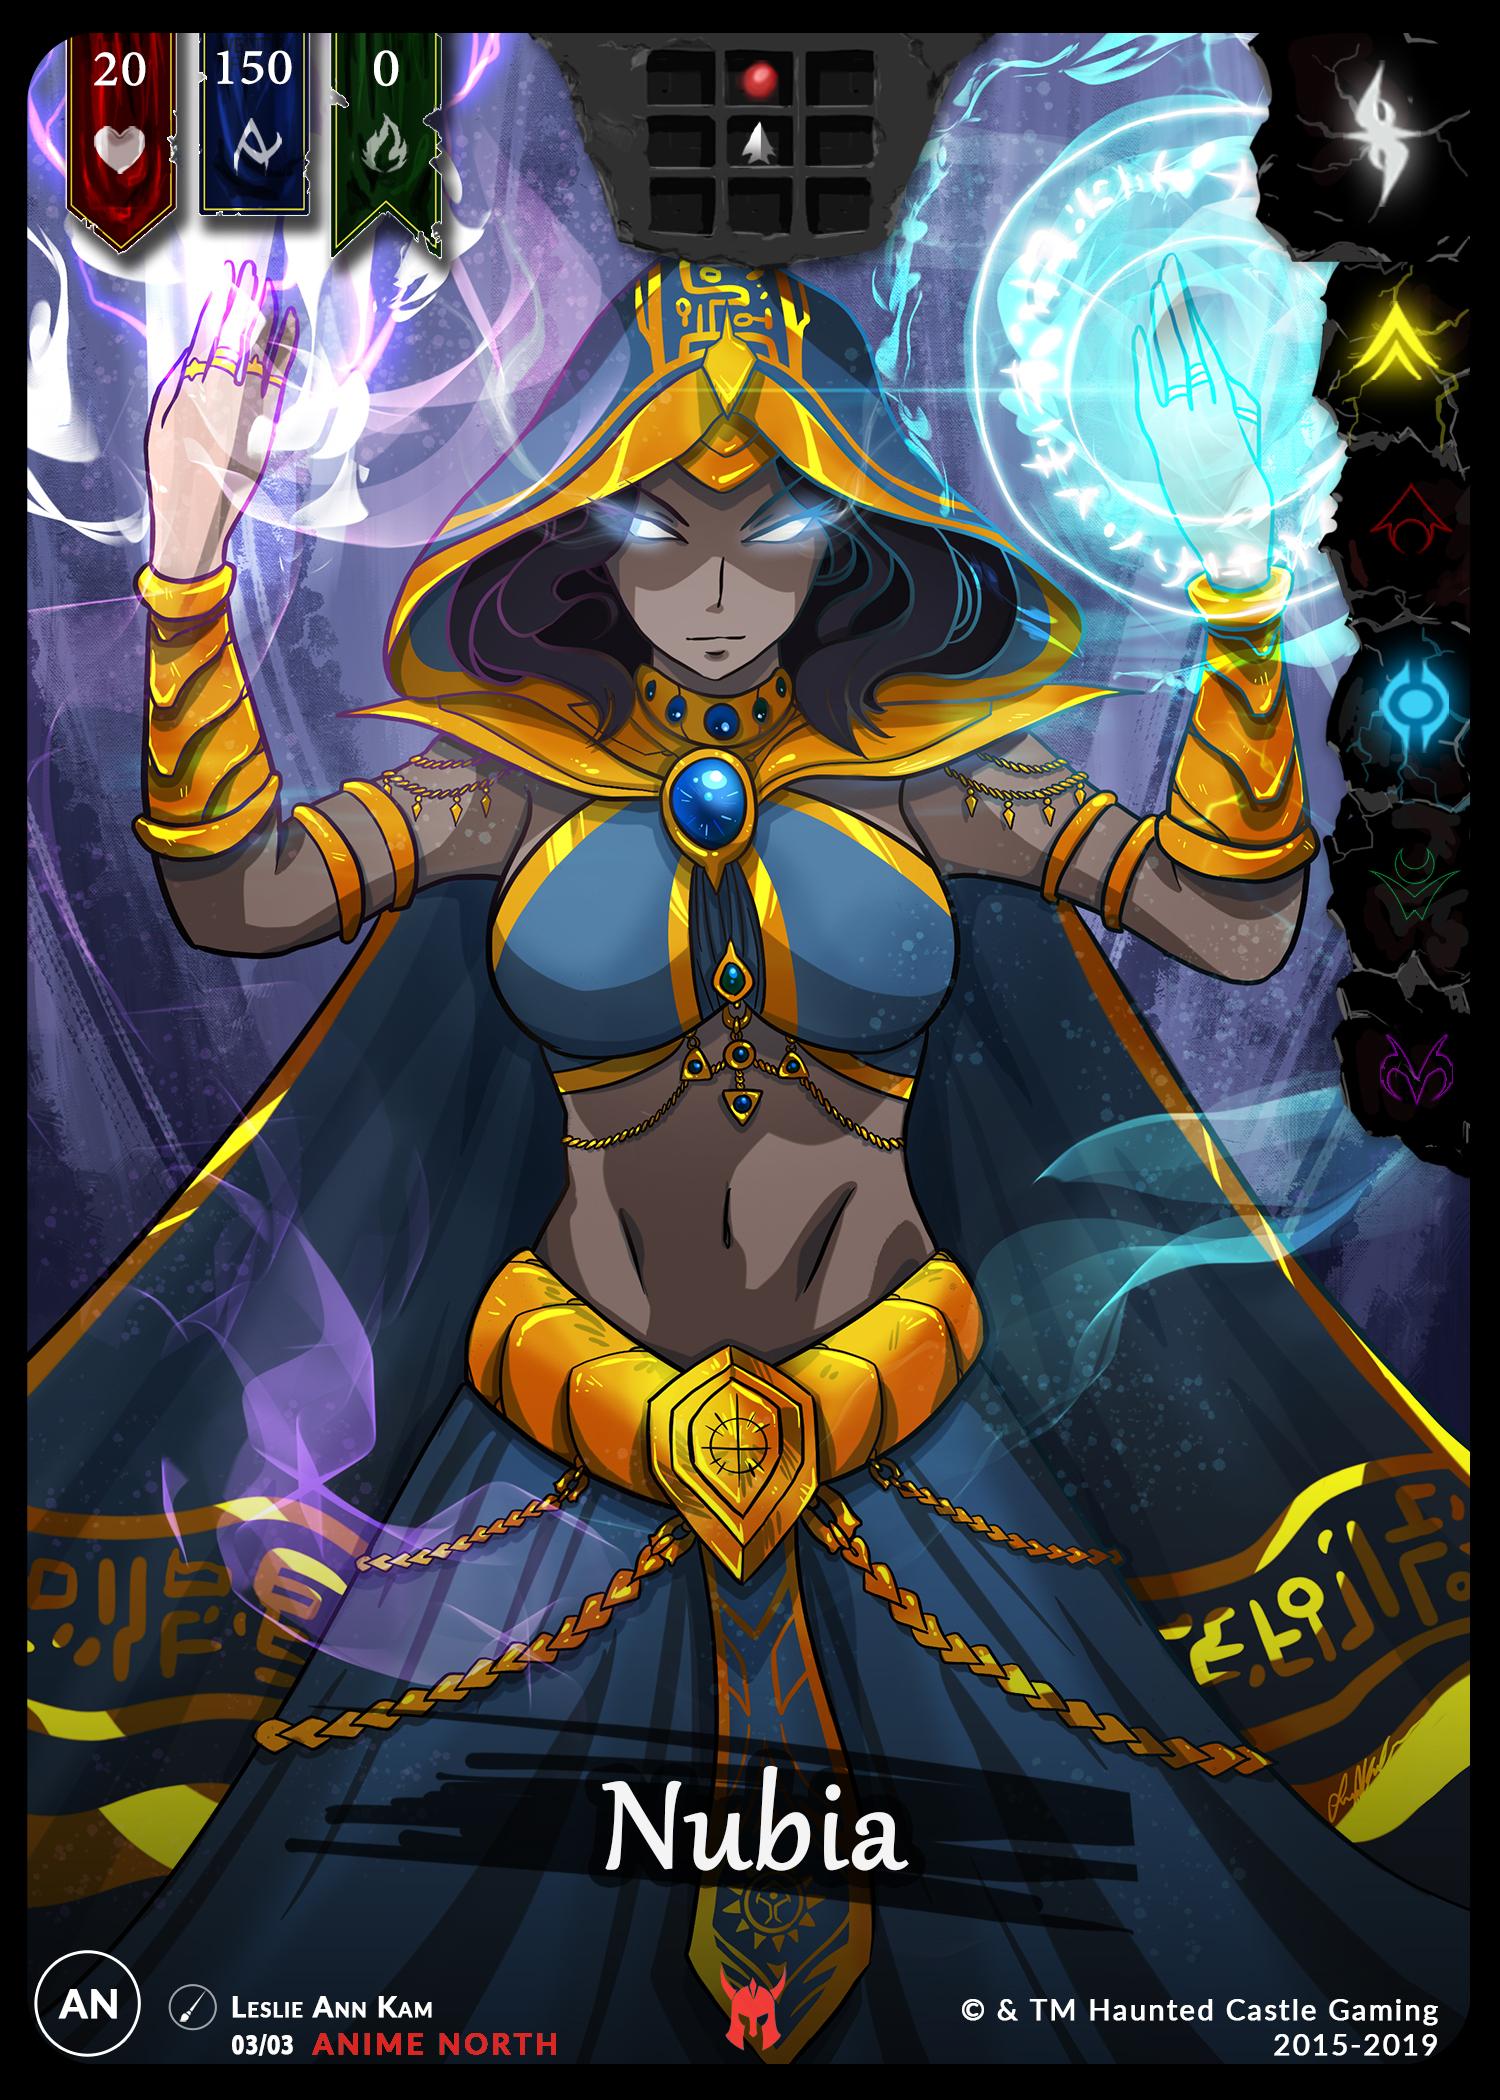 03-Nubia-Anime North-Full Art.jpg